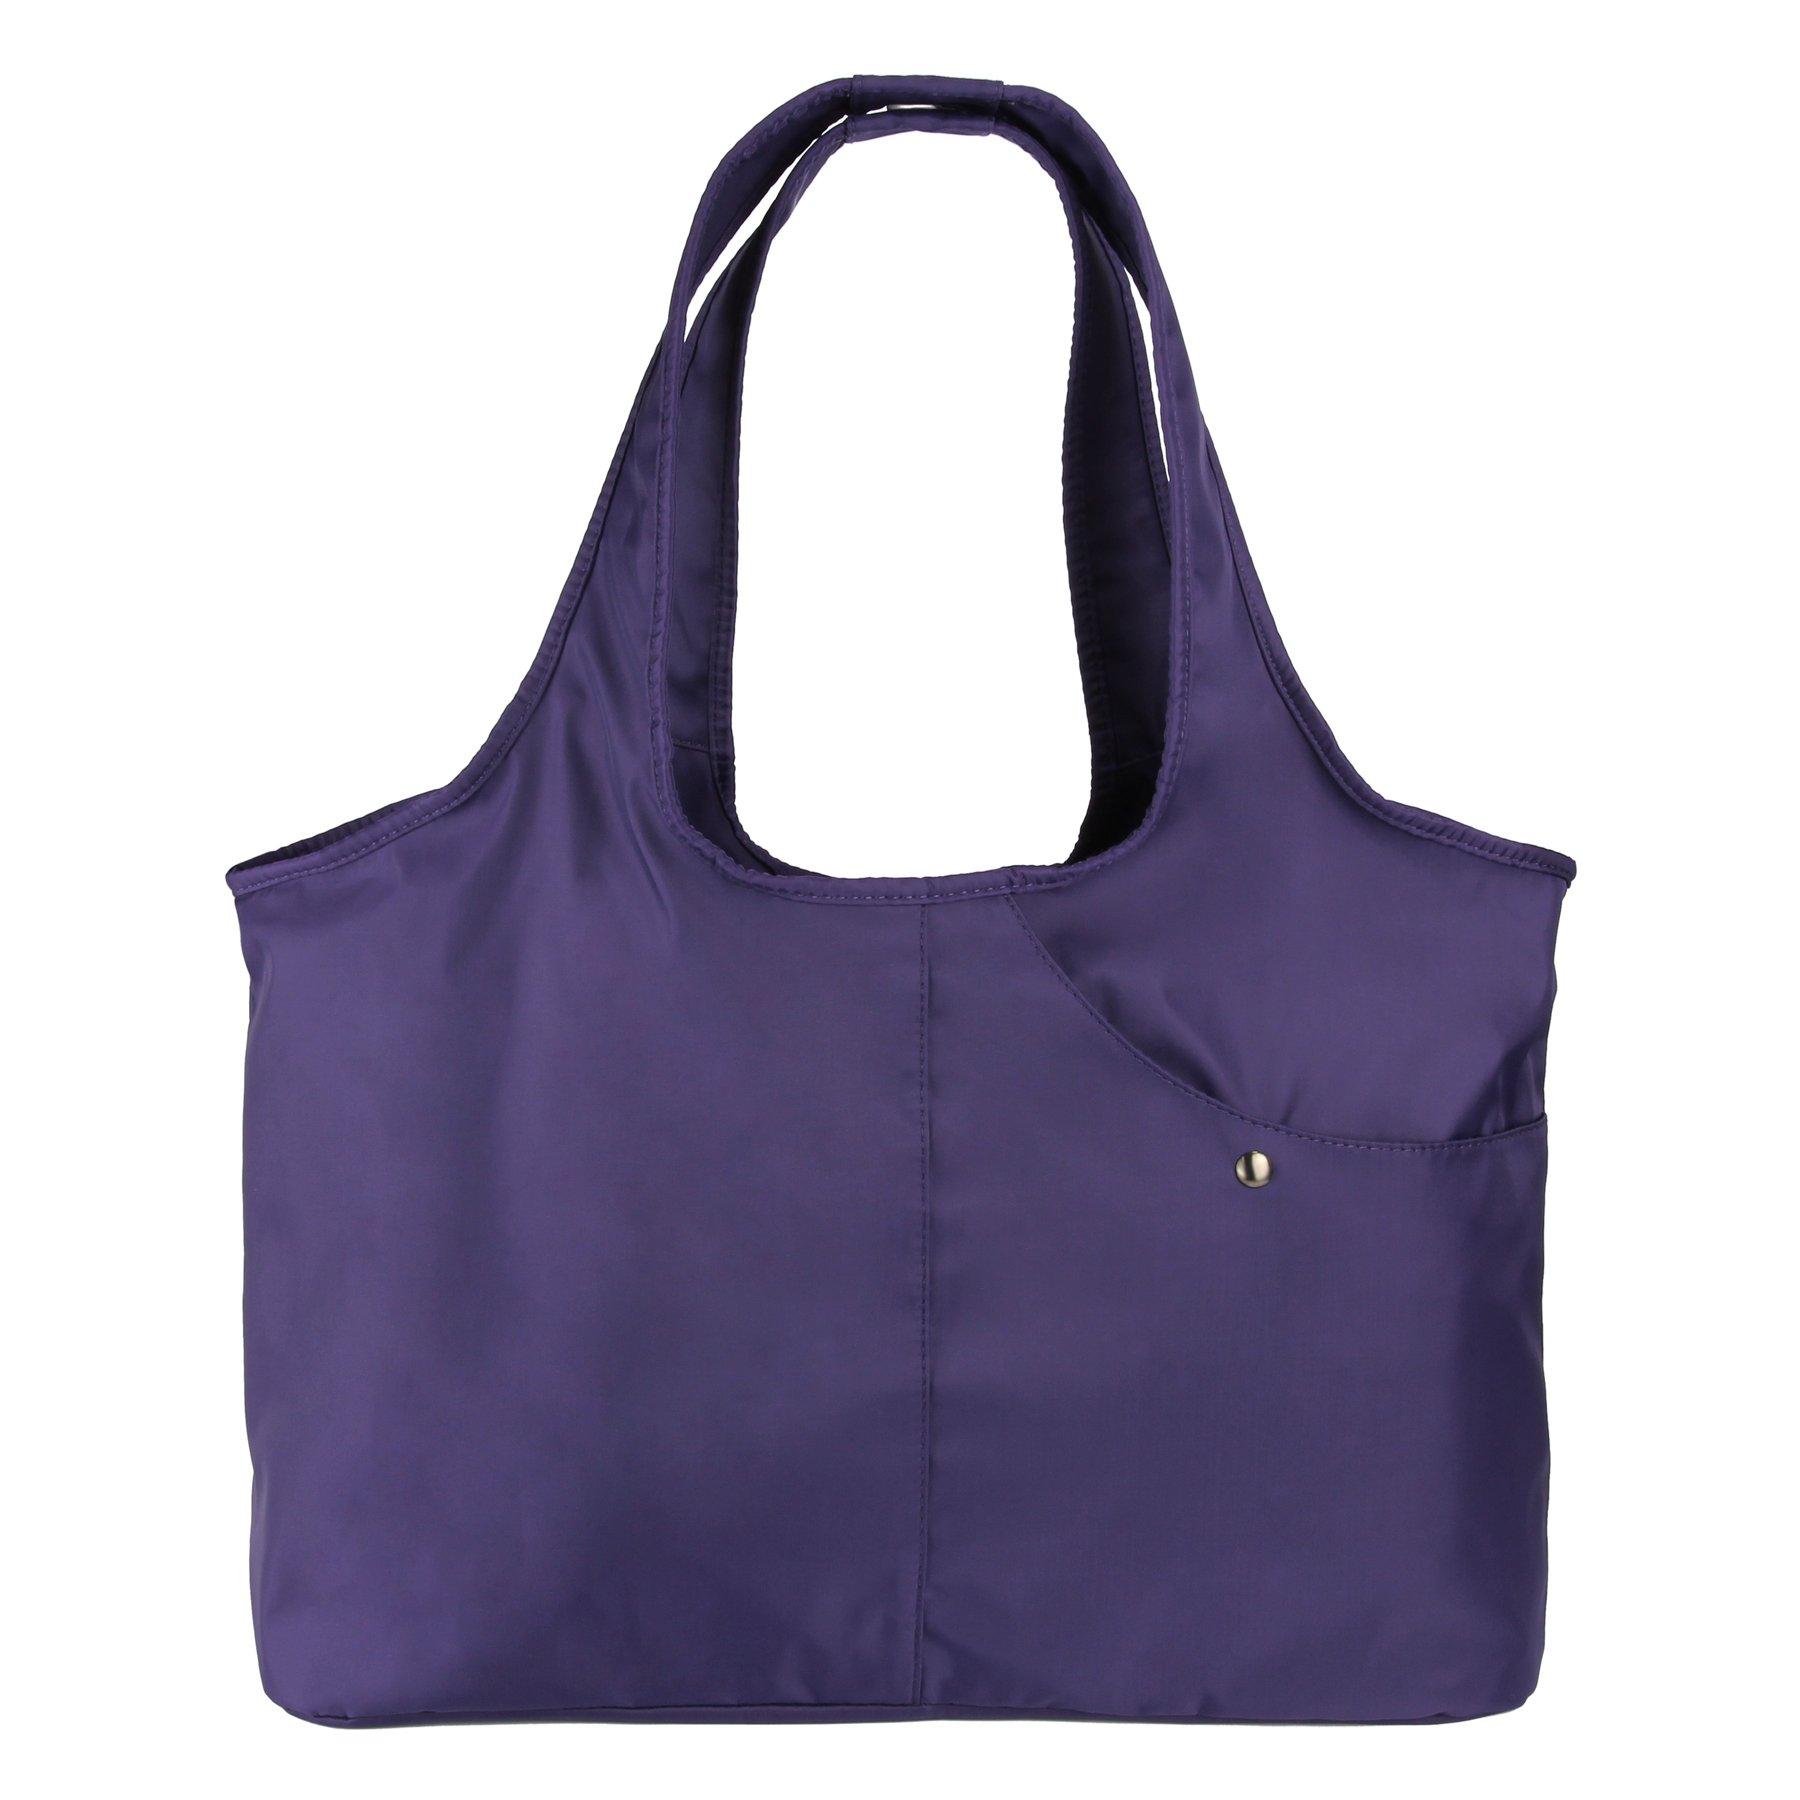 ZORESS Women Fashion Large Tote Shoulder Handbag Waterproof Tote Bag Multi-function Nylon Travel Shoulder(Purple)